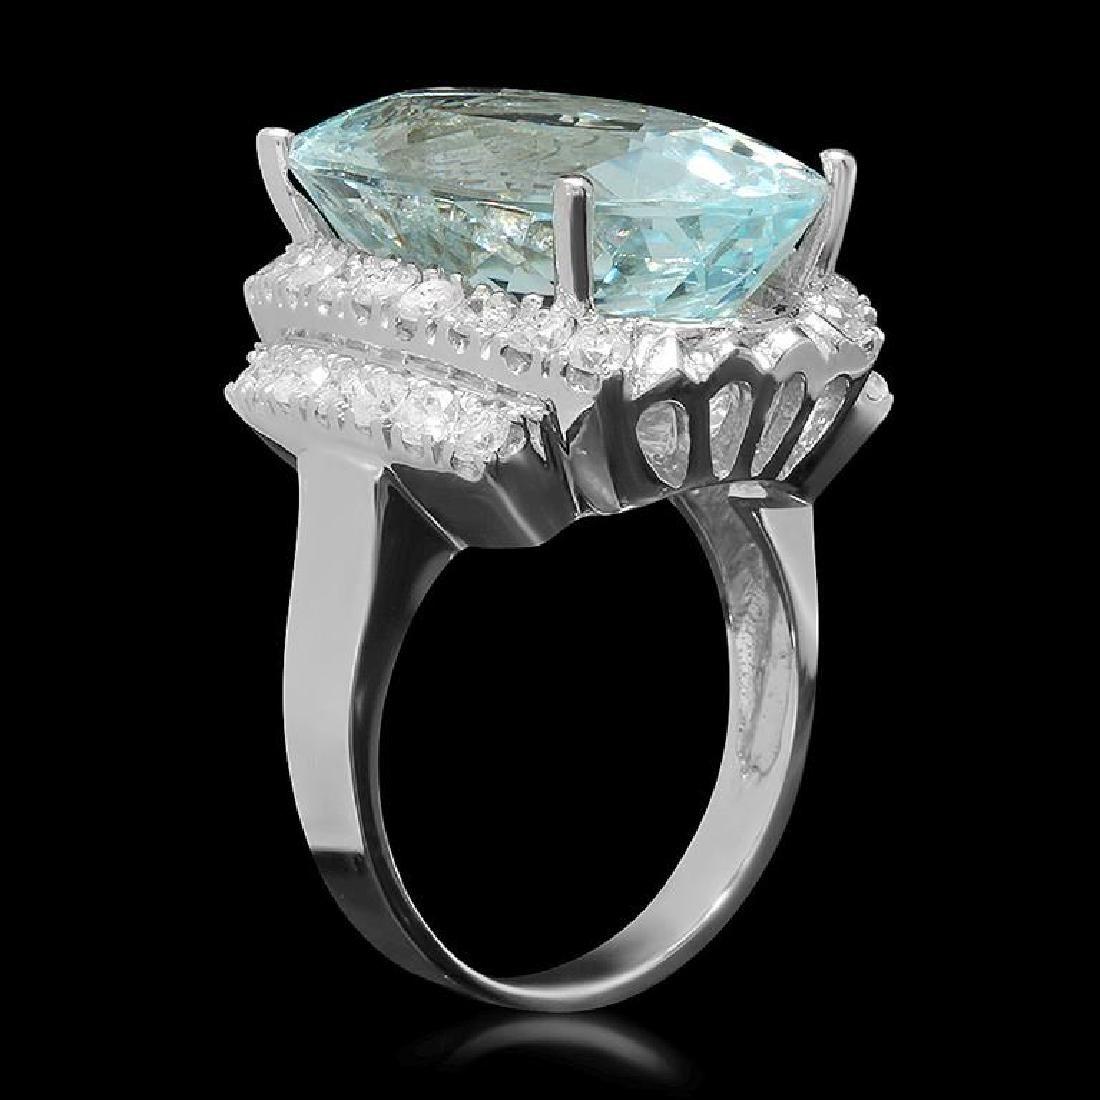 14K Gold 14.95ct Aquamarine 1.17ct Diamond Ring - 2